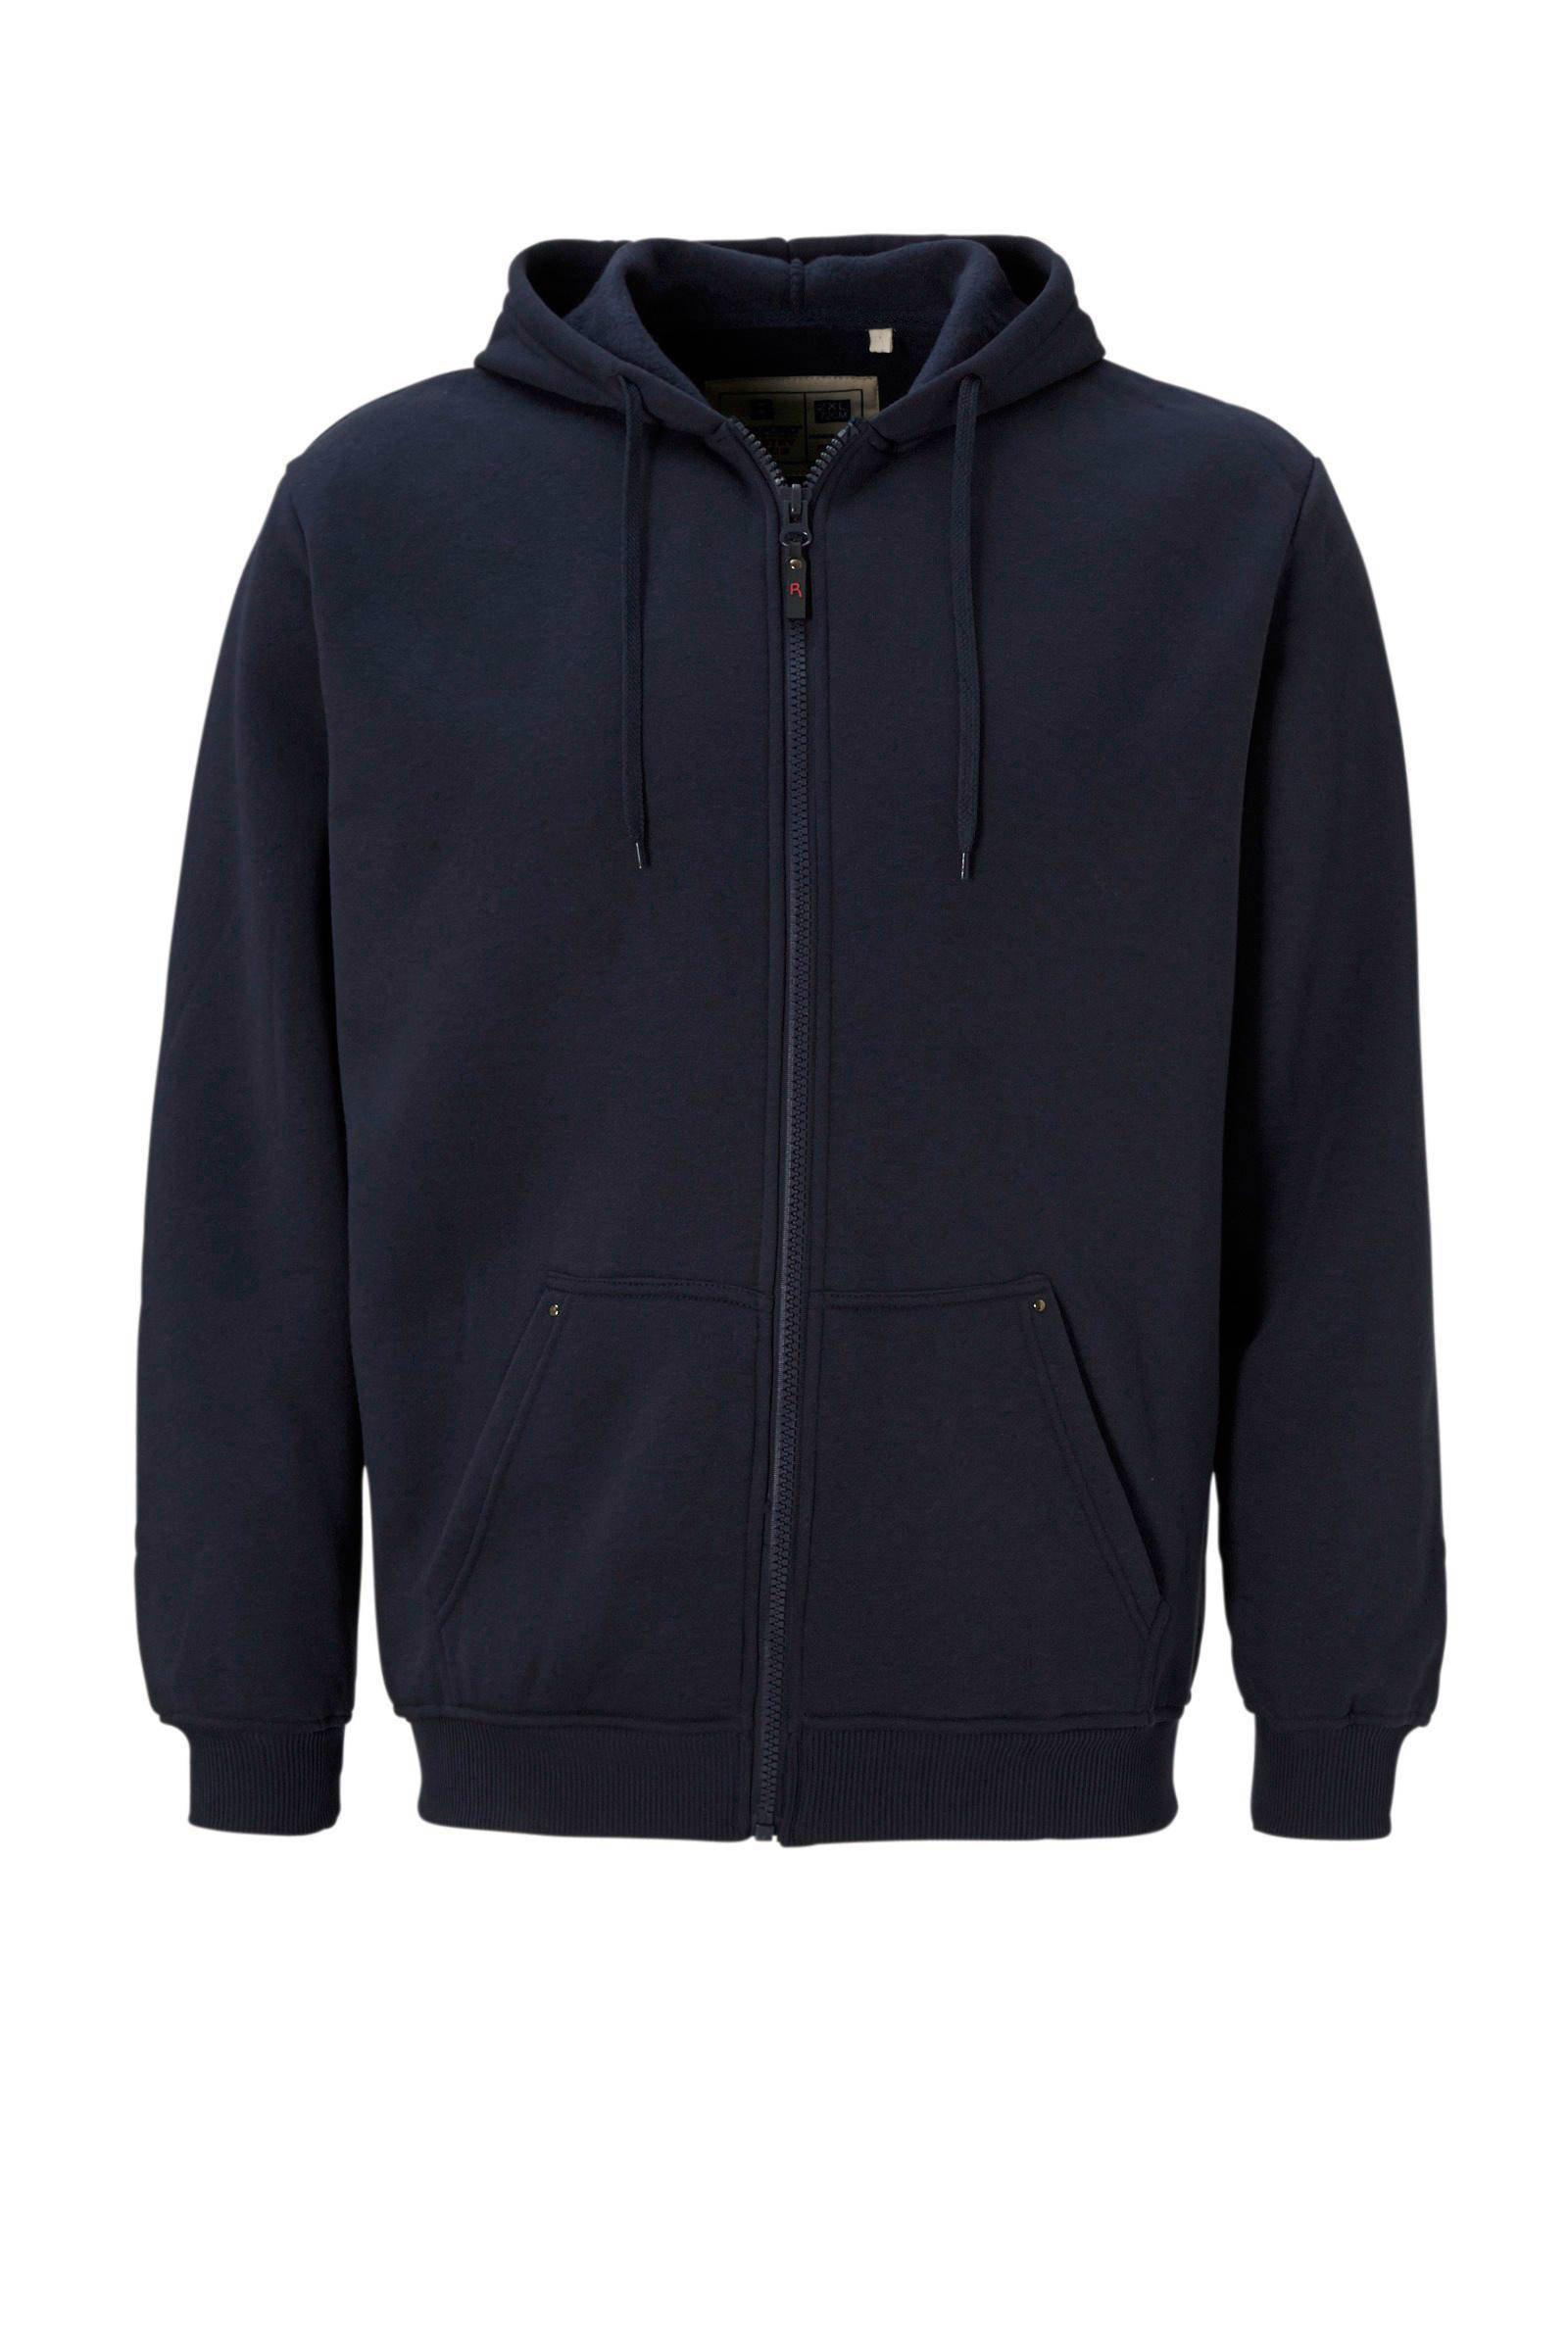 Rockford +size hooded sweatvest